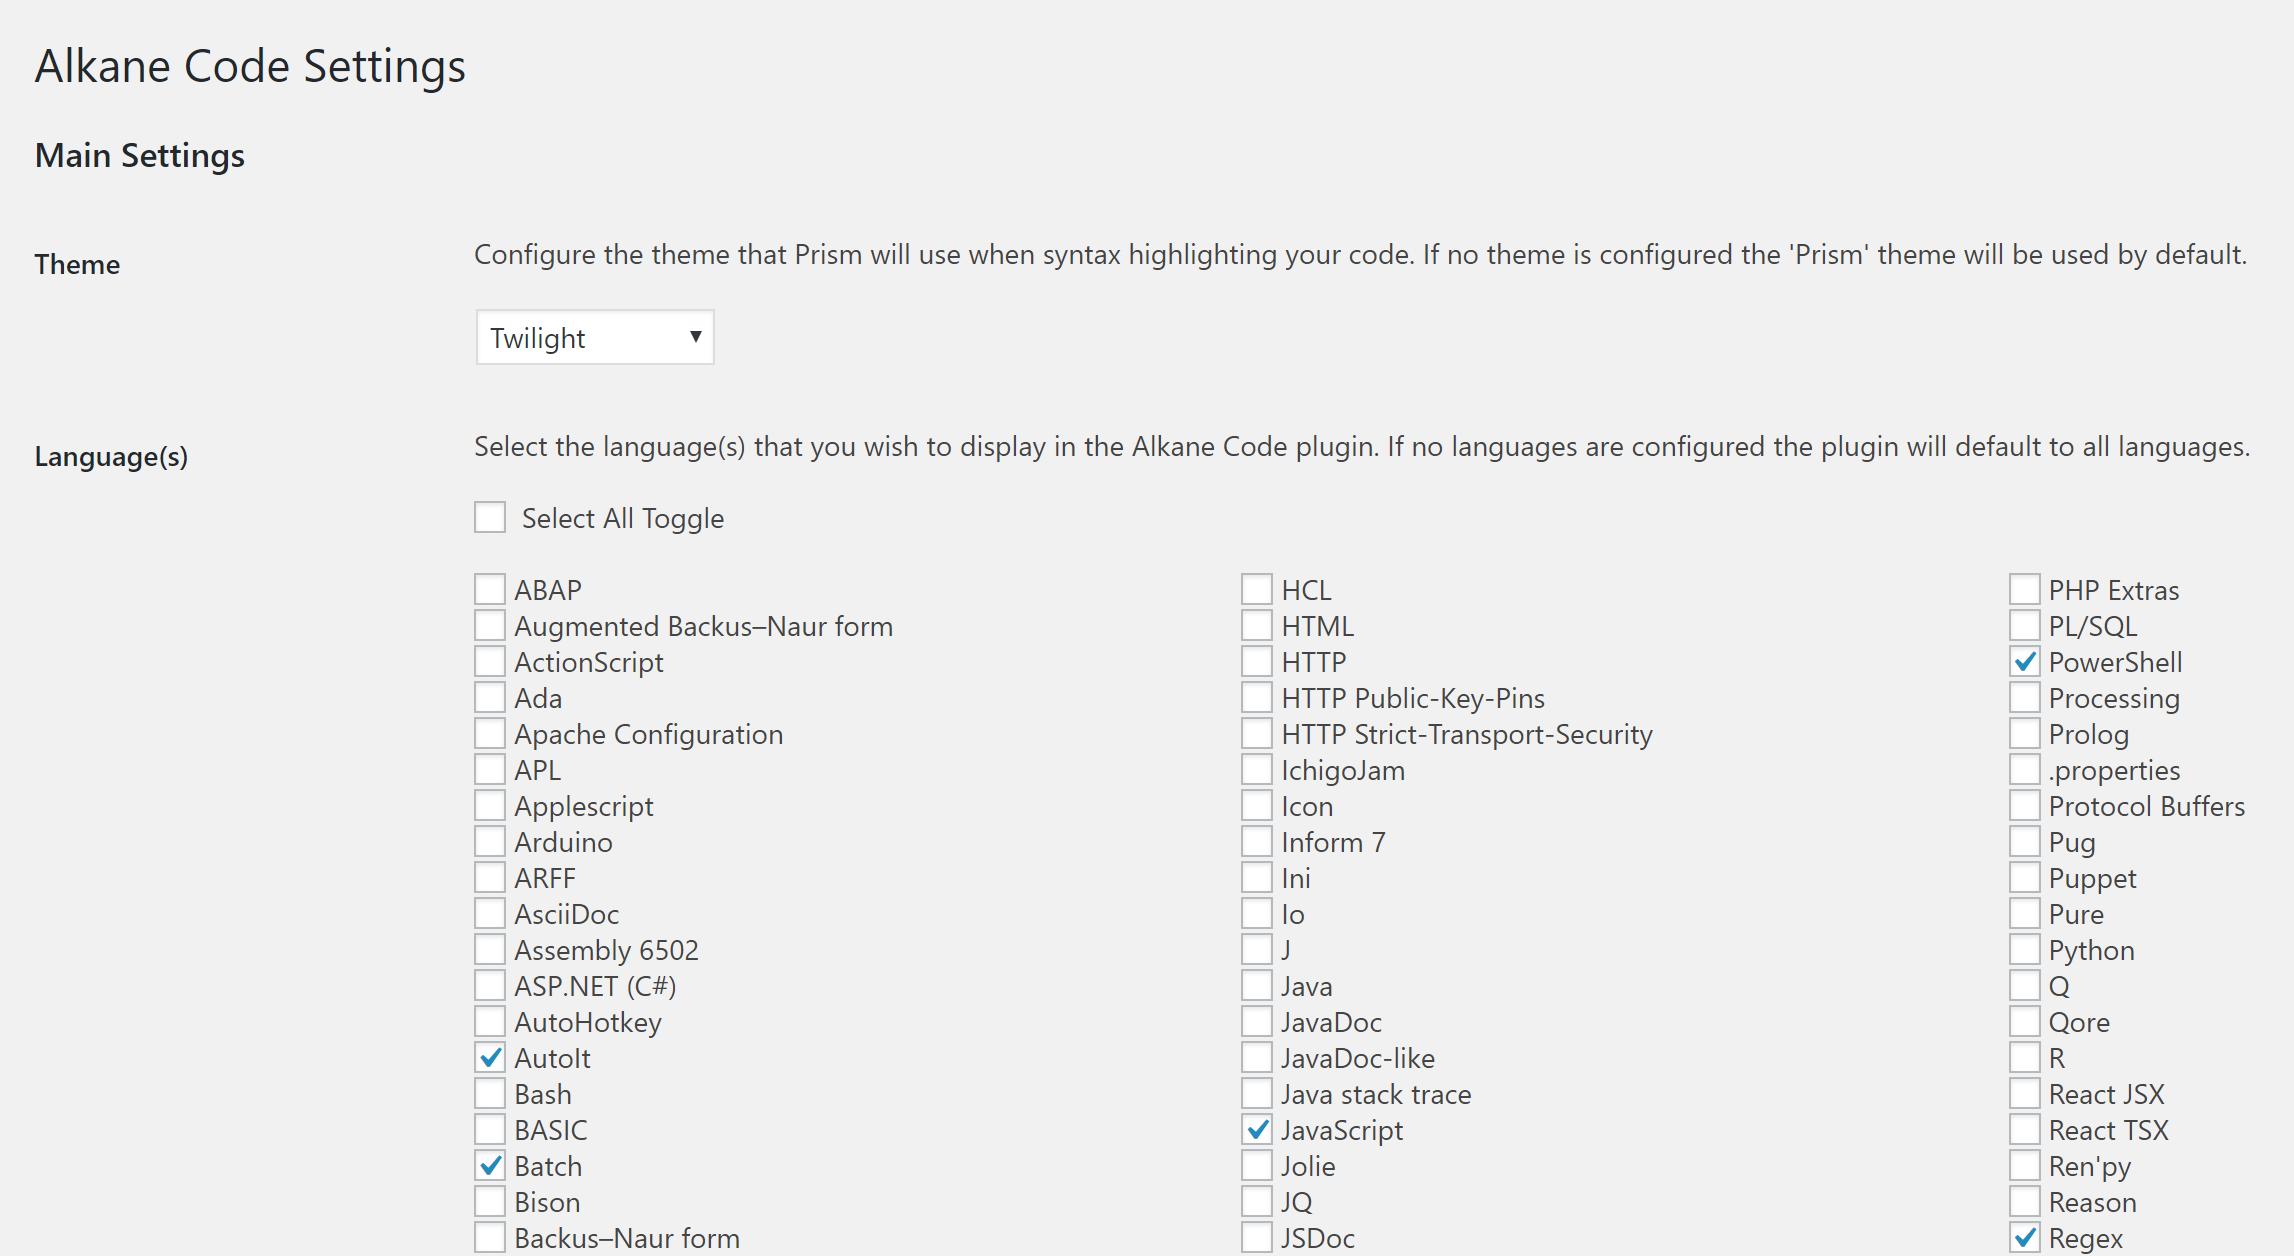 Alkane Code settings page.